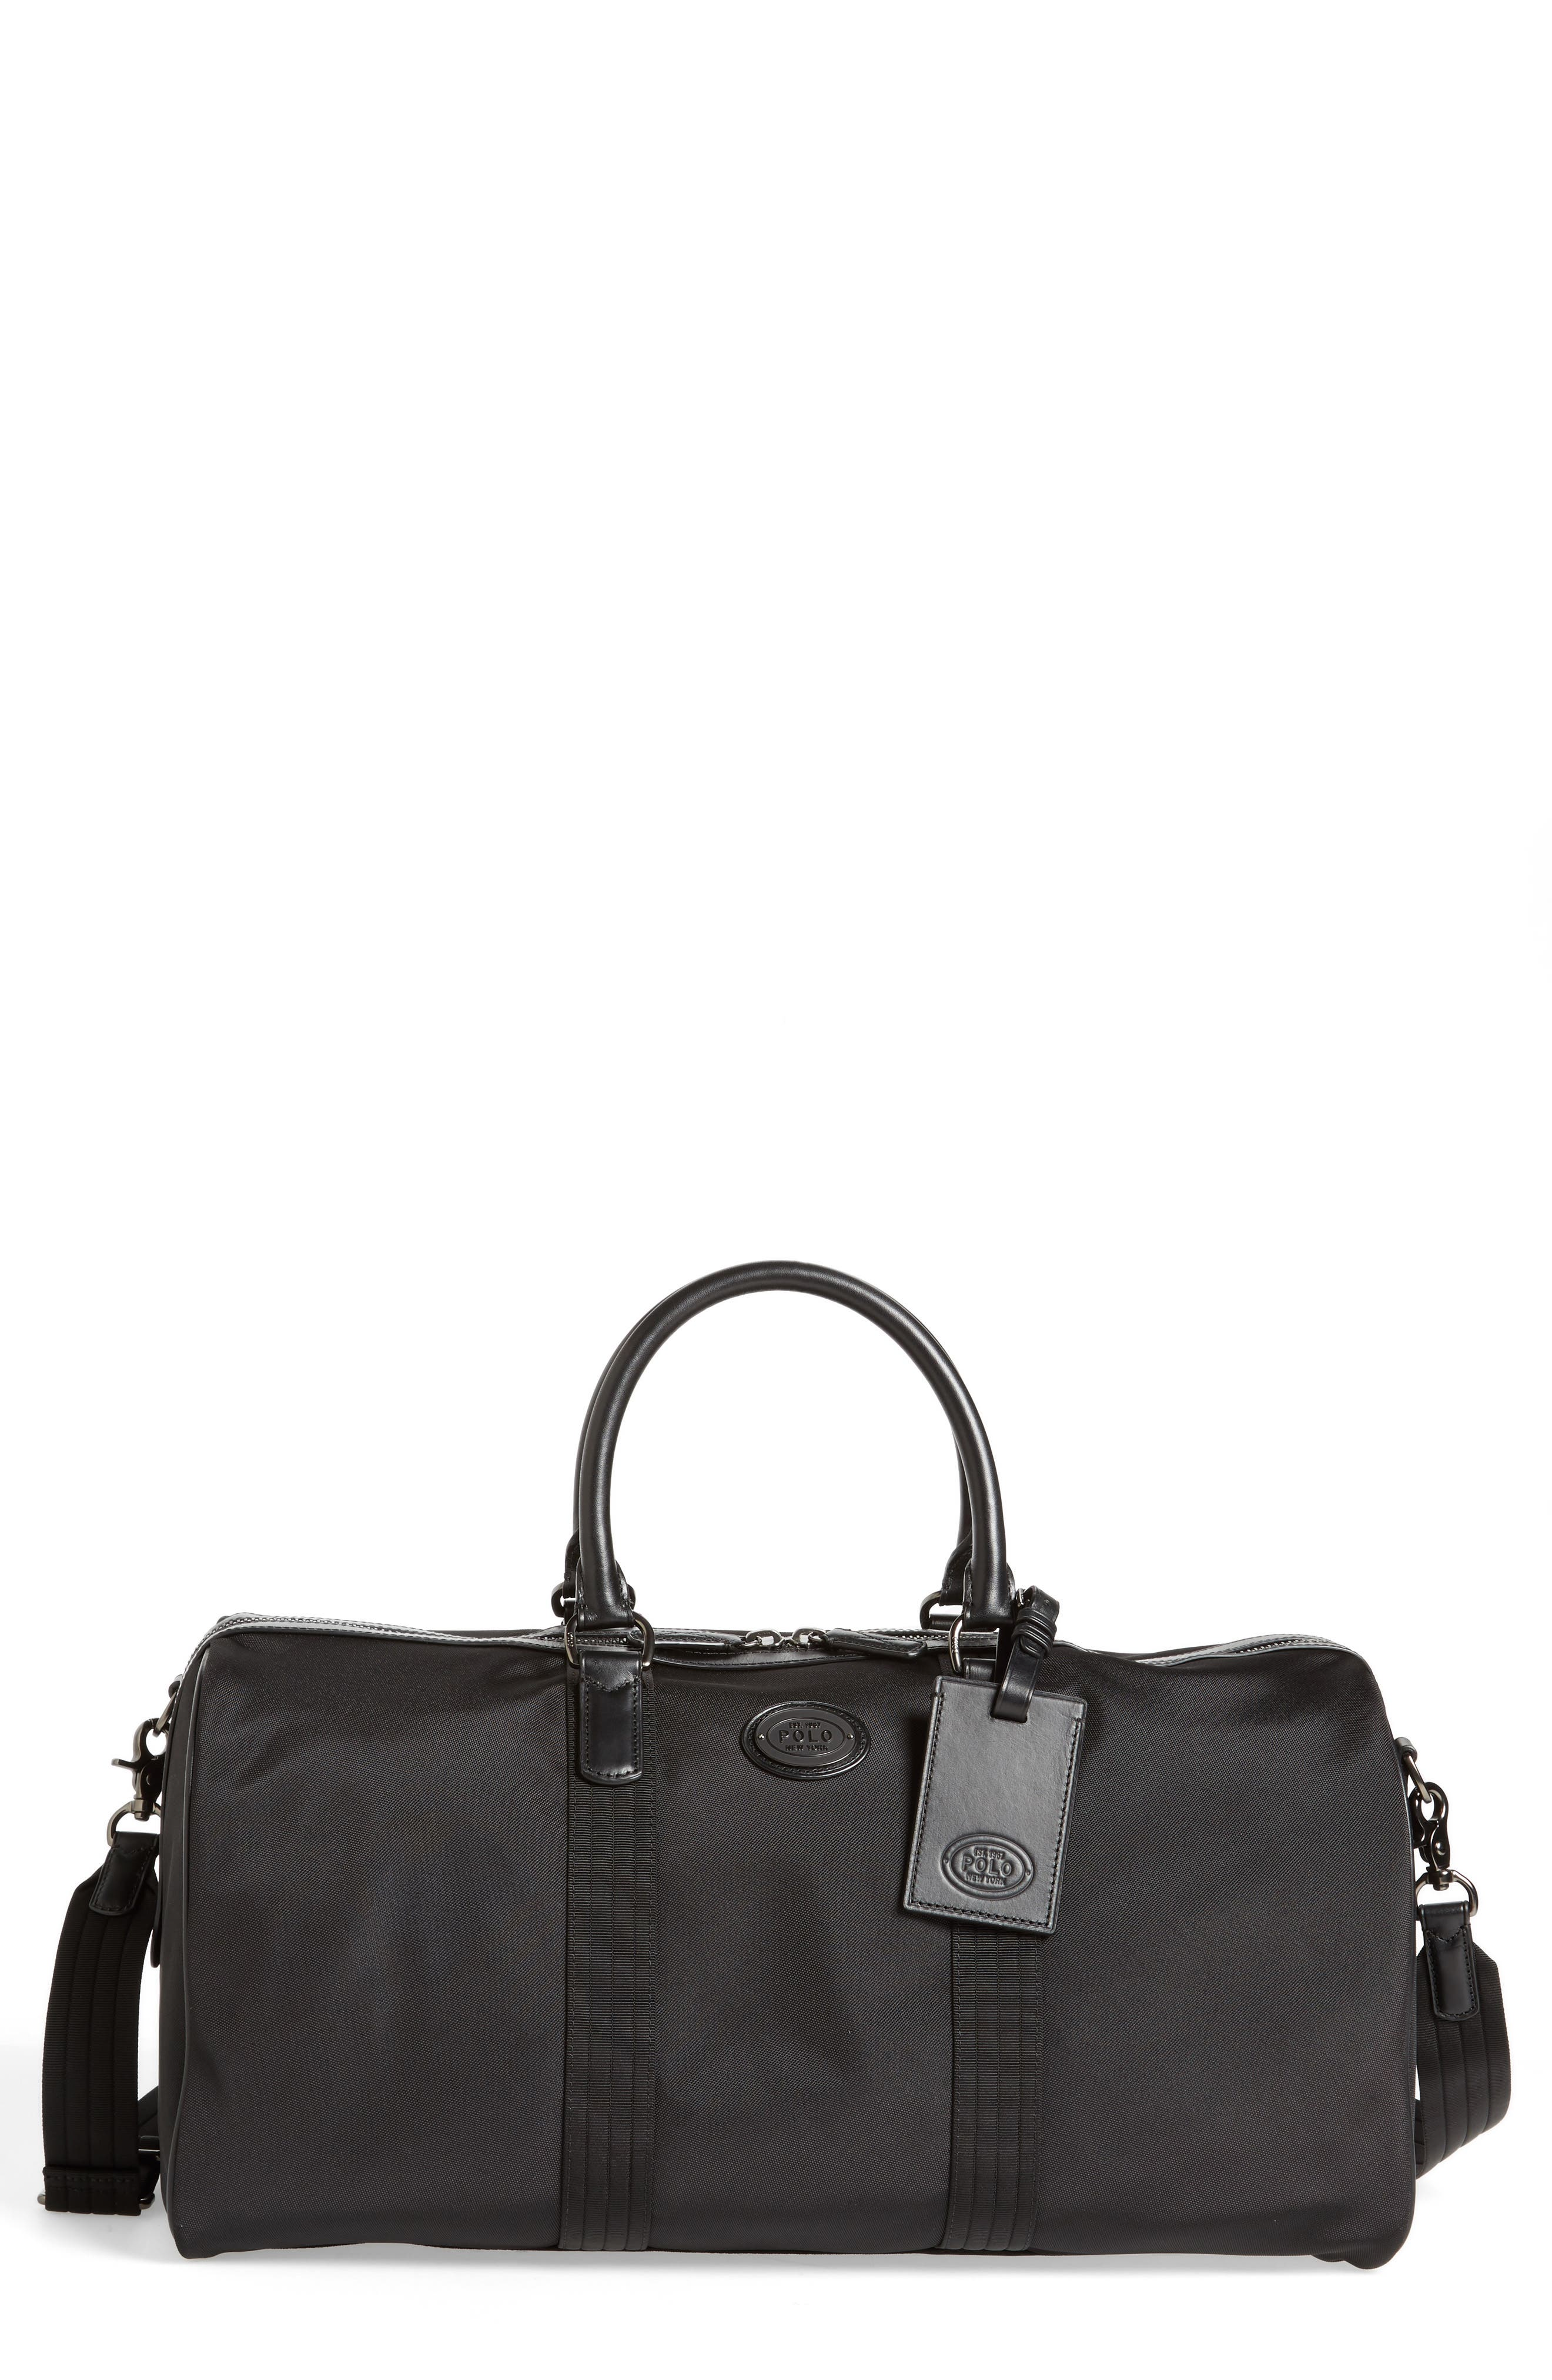 Alternate Image 1 Selected - Polo Ralph Lauren Thompson Duffel Bag